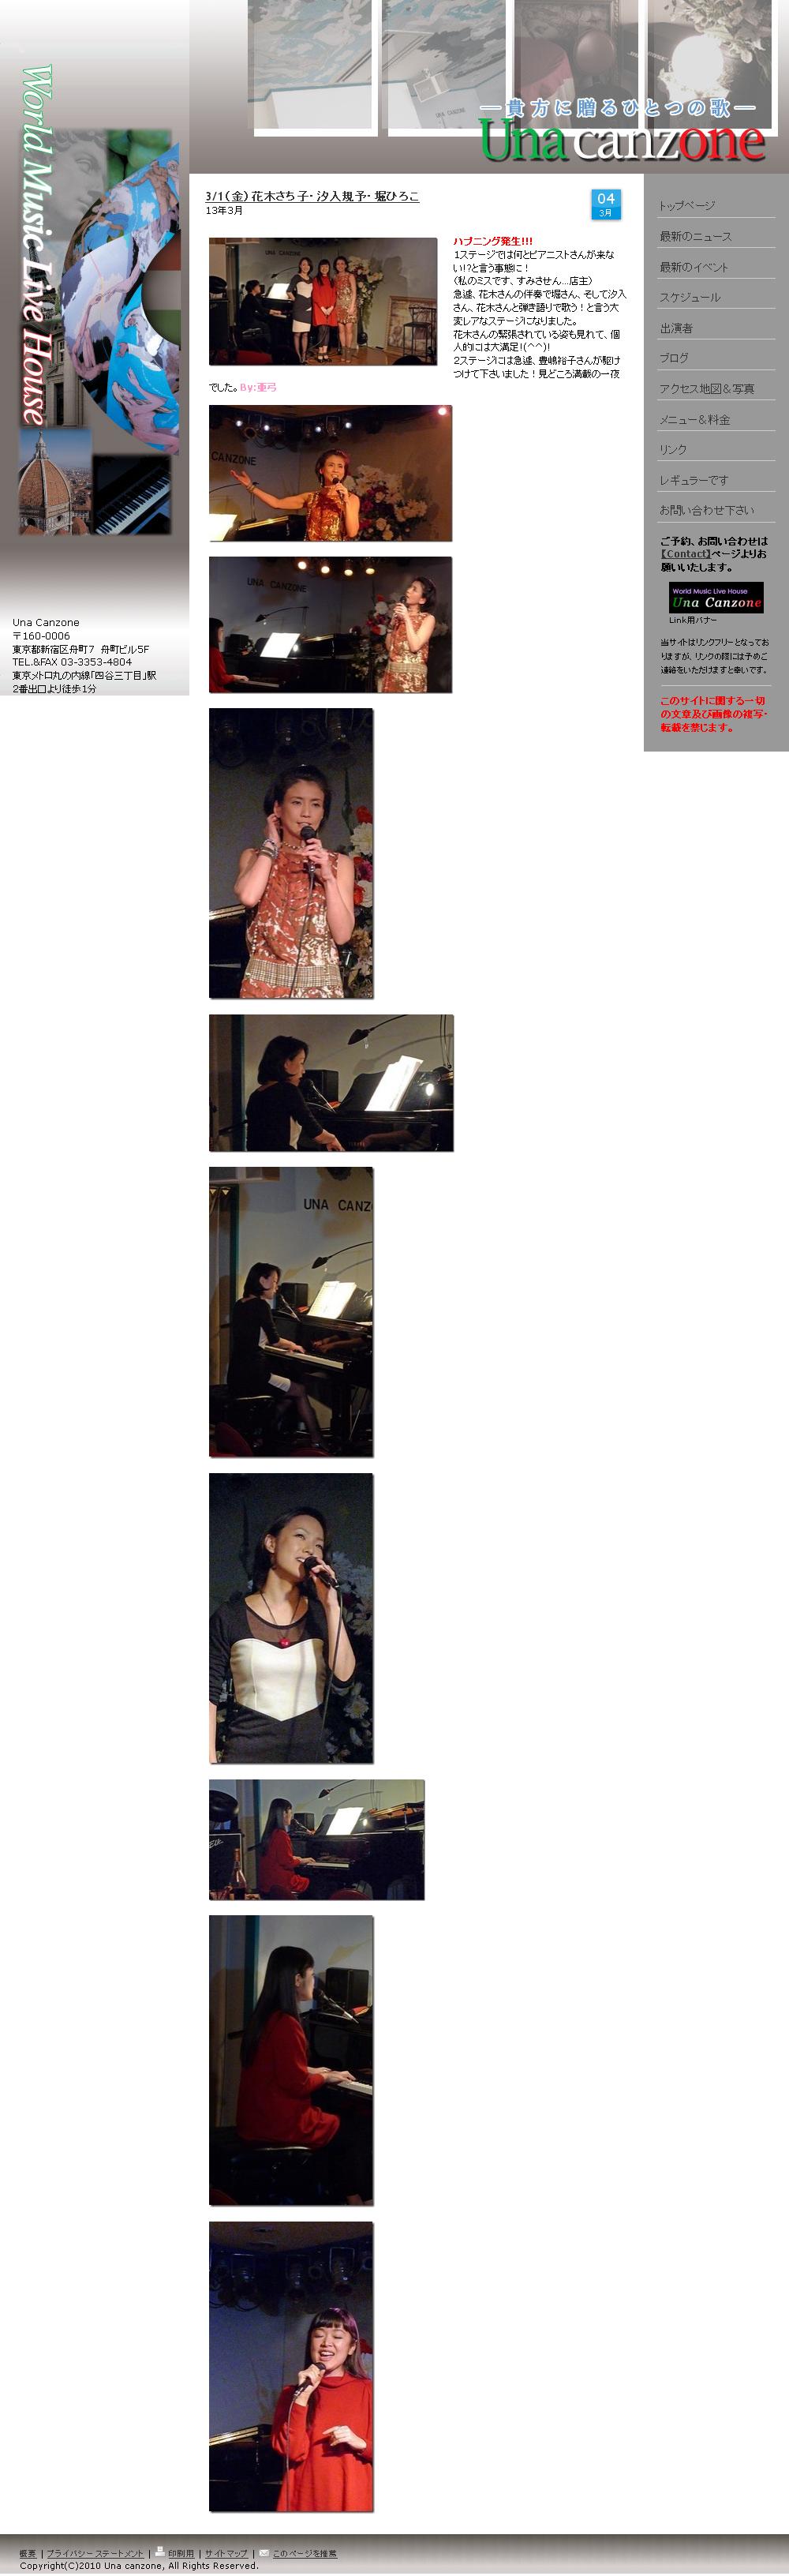 http://www.una-canzone.com/2013/03/04/3-1-金-花木さち子-汐入規代-堀ひろこ/